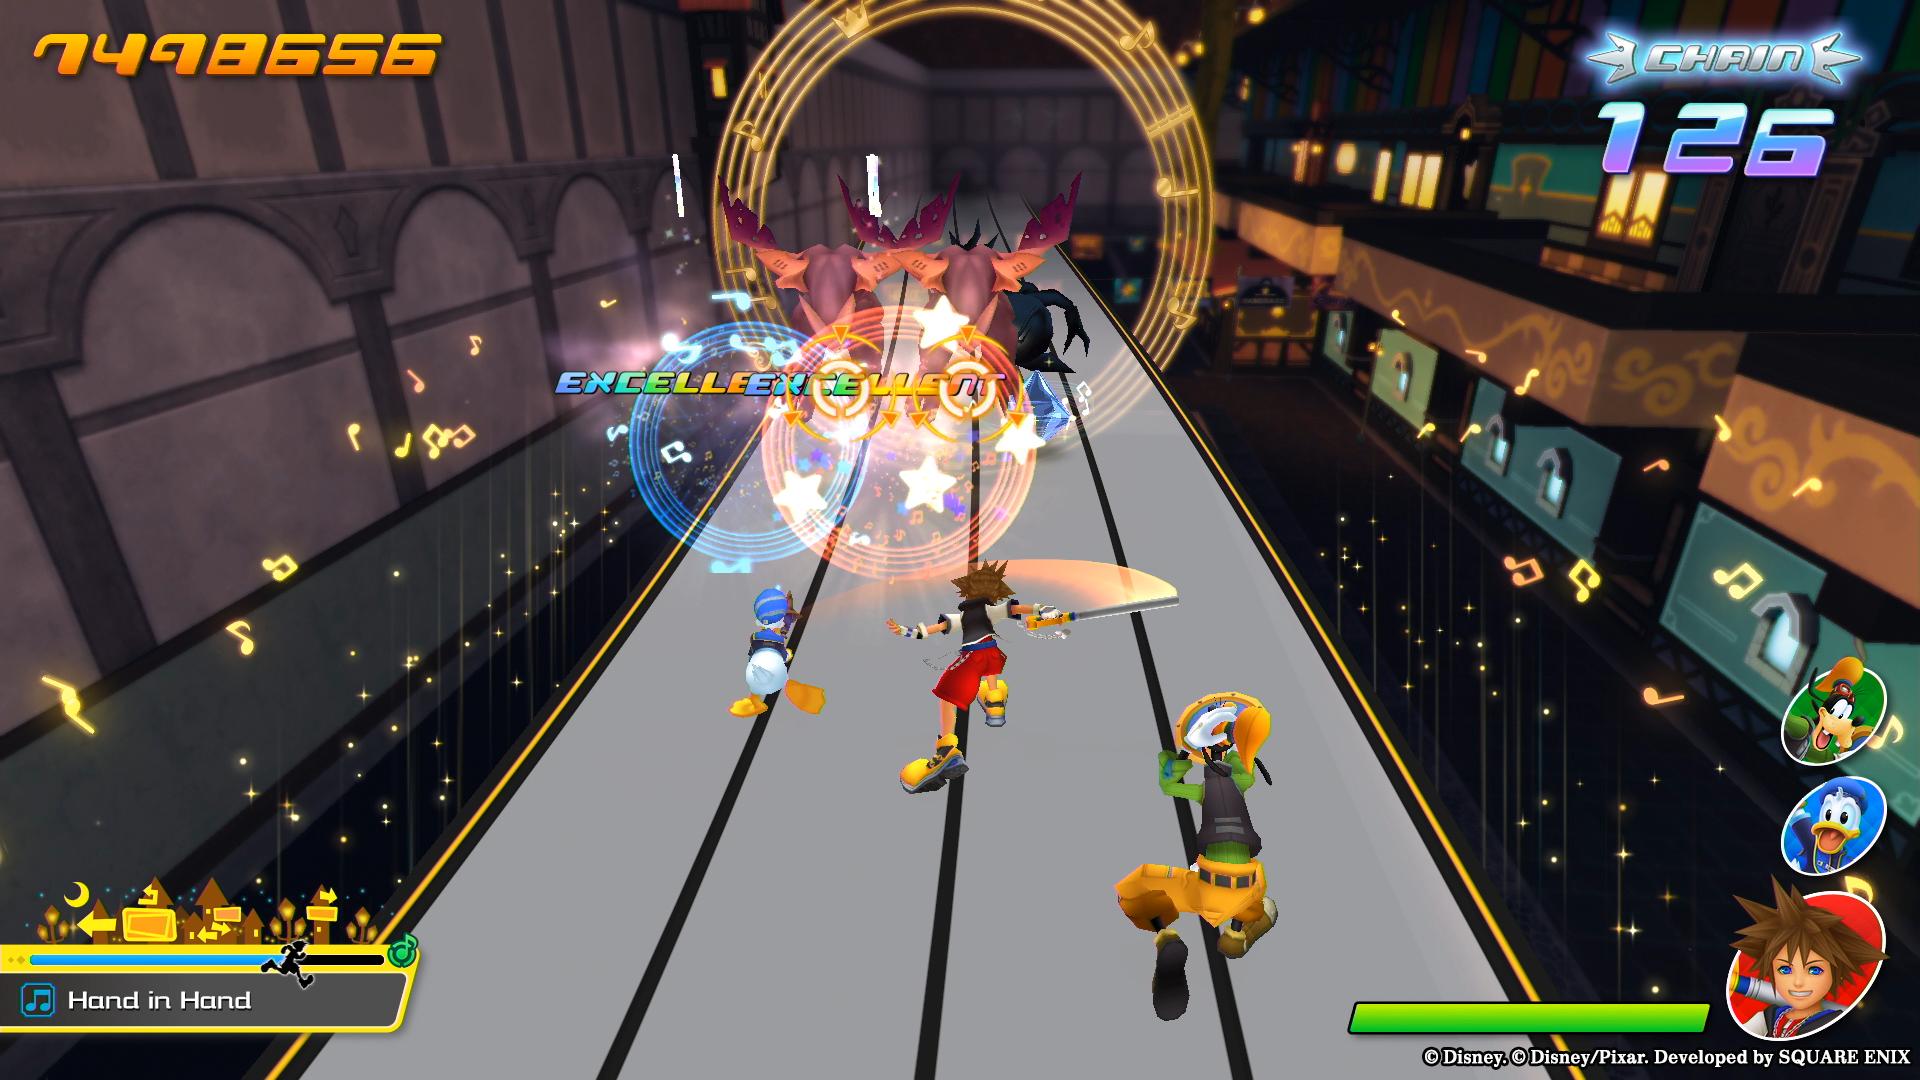 Kingdom Hearts: Melody of Memory gameplay